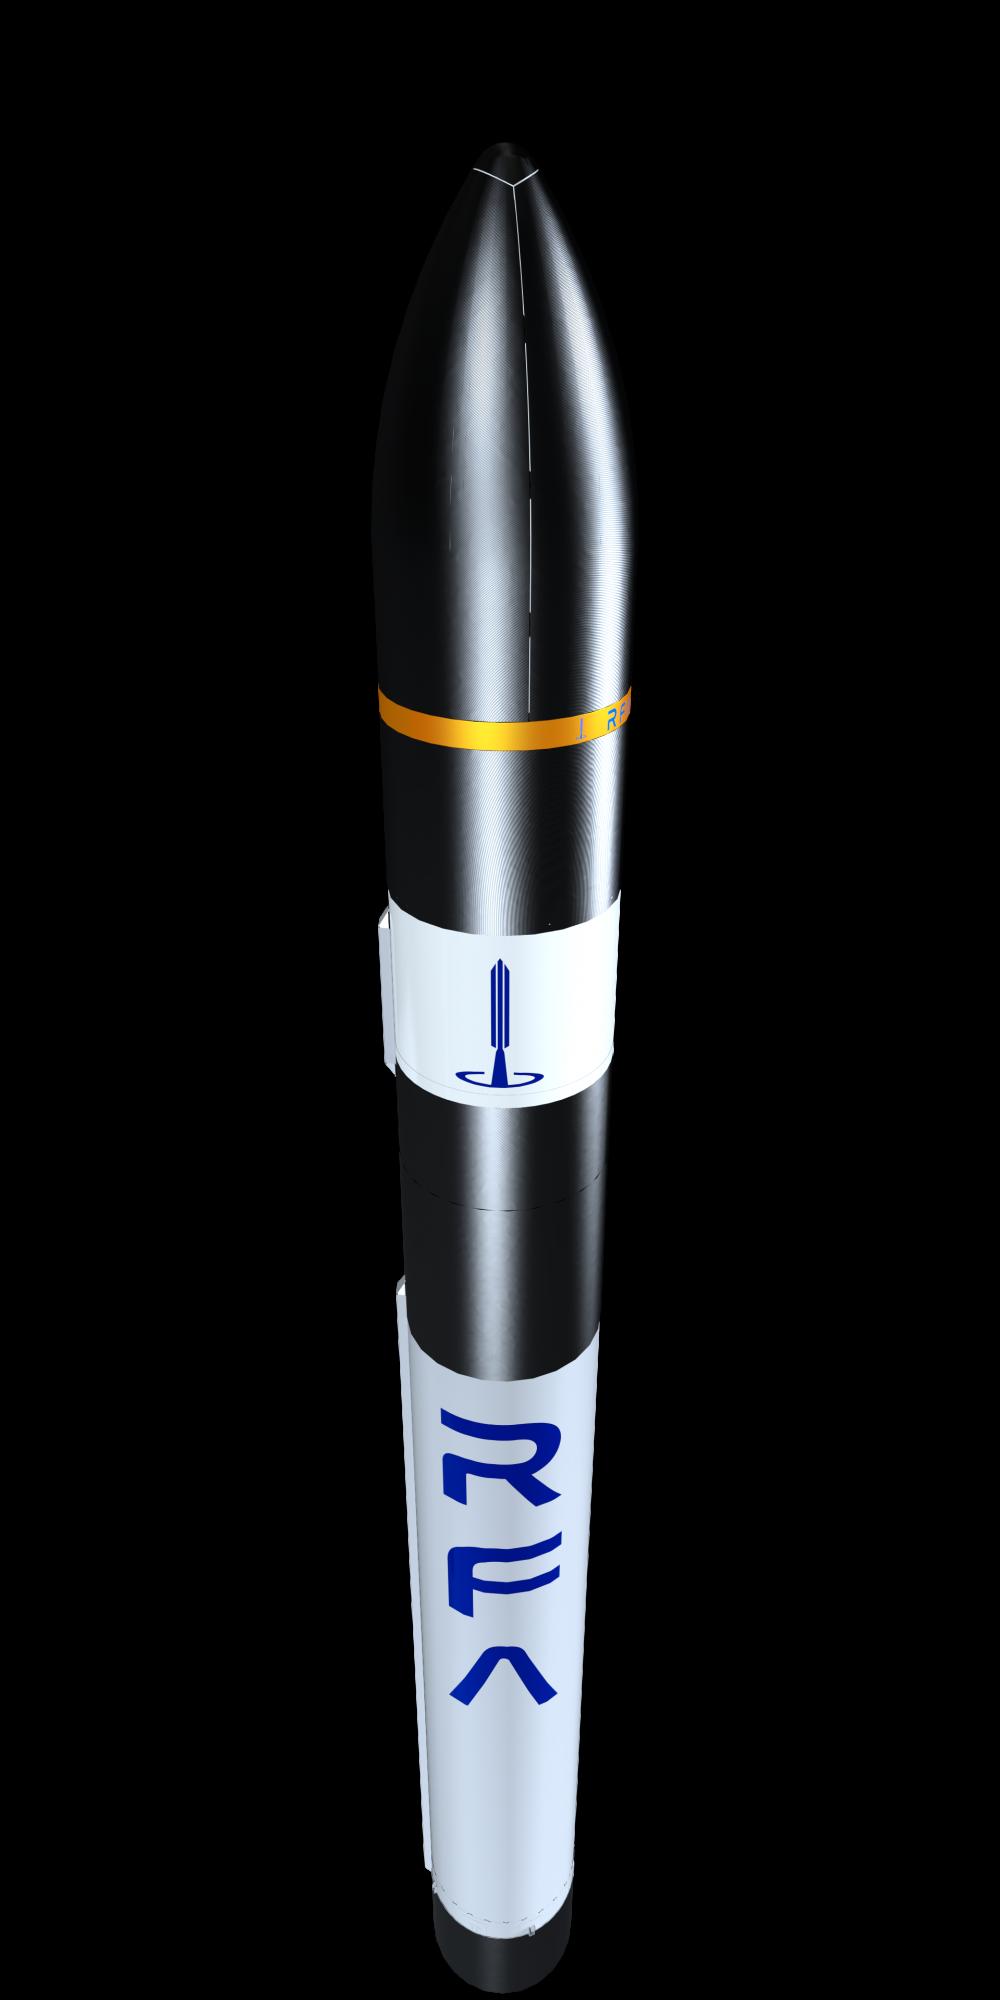 Full Rocket_Perspective_v4